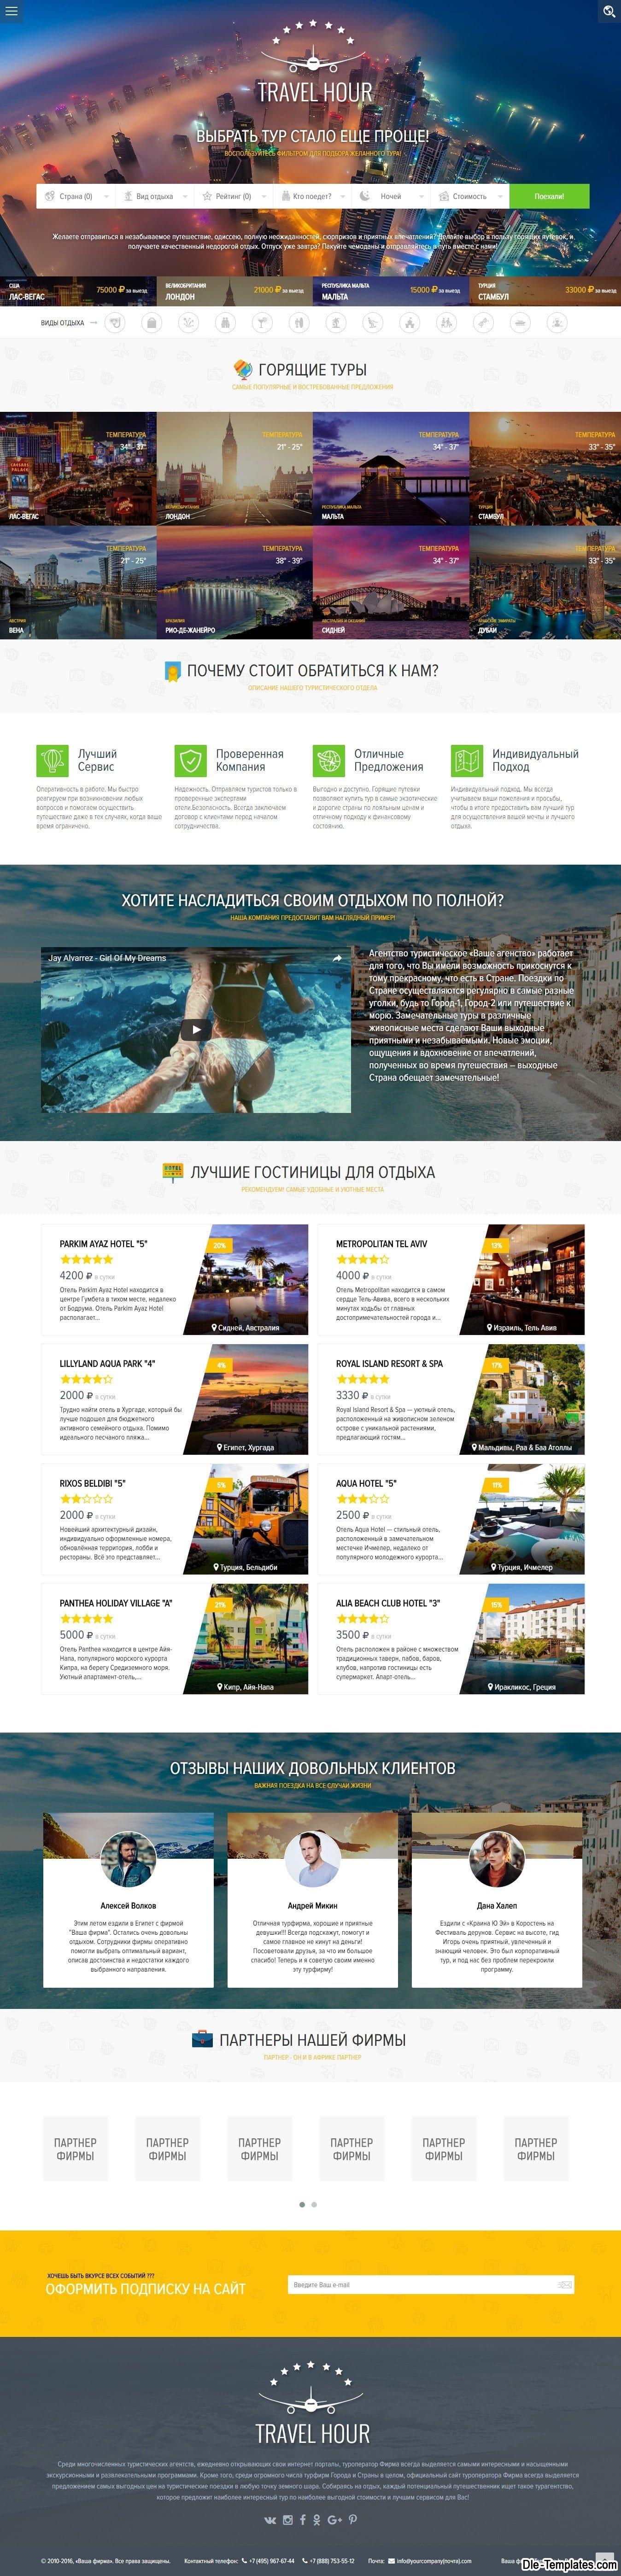 Travel Hour - адаптивный туристический шаблон для DLE | Template